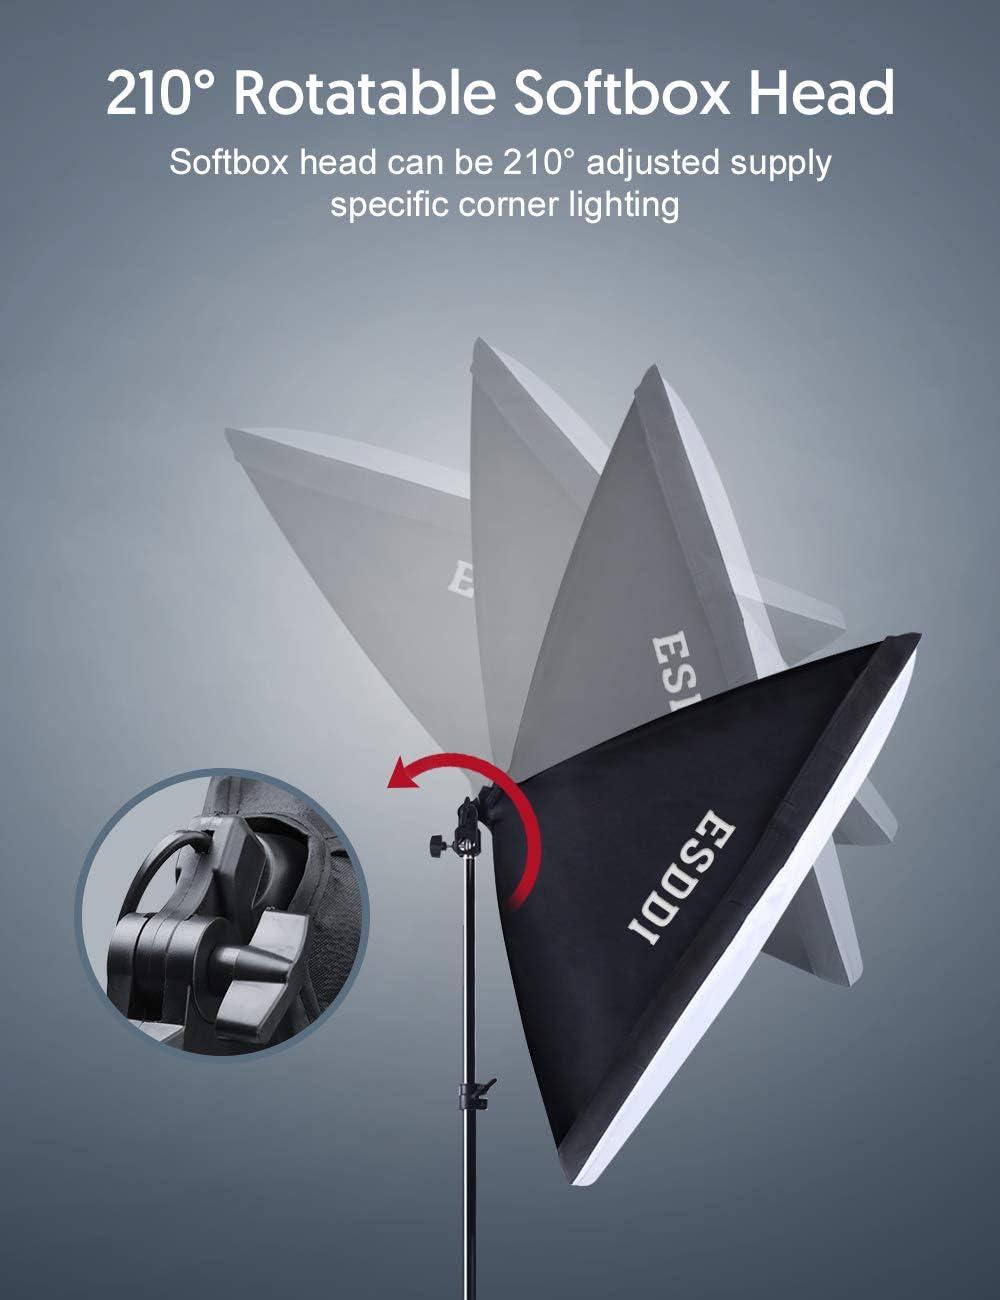 ESDDI Softbox 900W Lighting Kit Professional Photo Studio Equipment with 5500K E27 Socket and 2x50x50 cm Reflectors and 2 LED Bulbs Energy Saving Lighting for Portrait Fashion and Product Photography